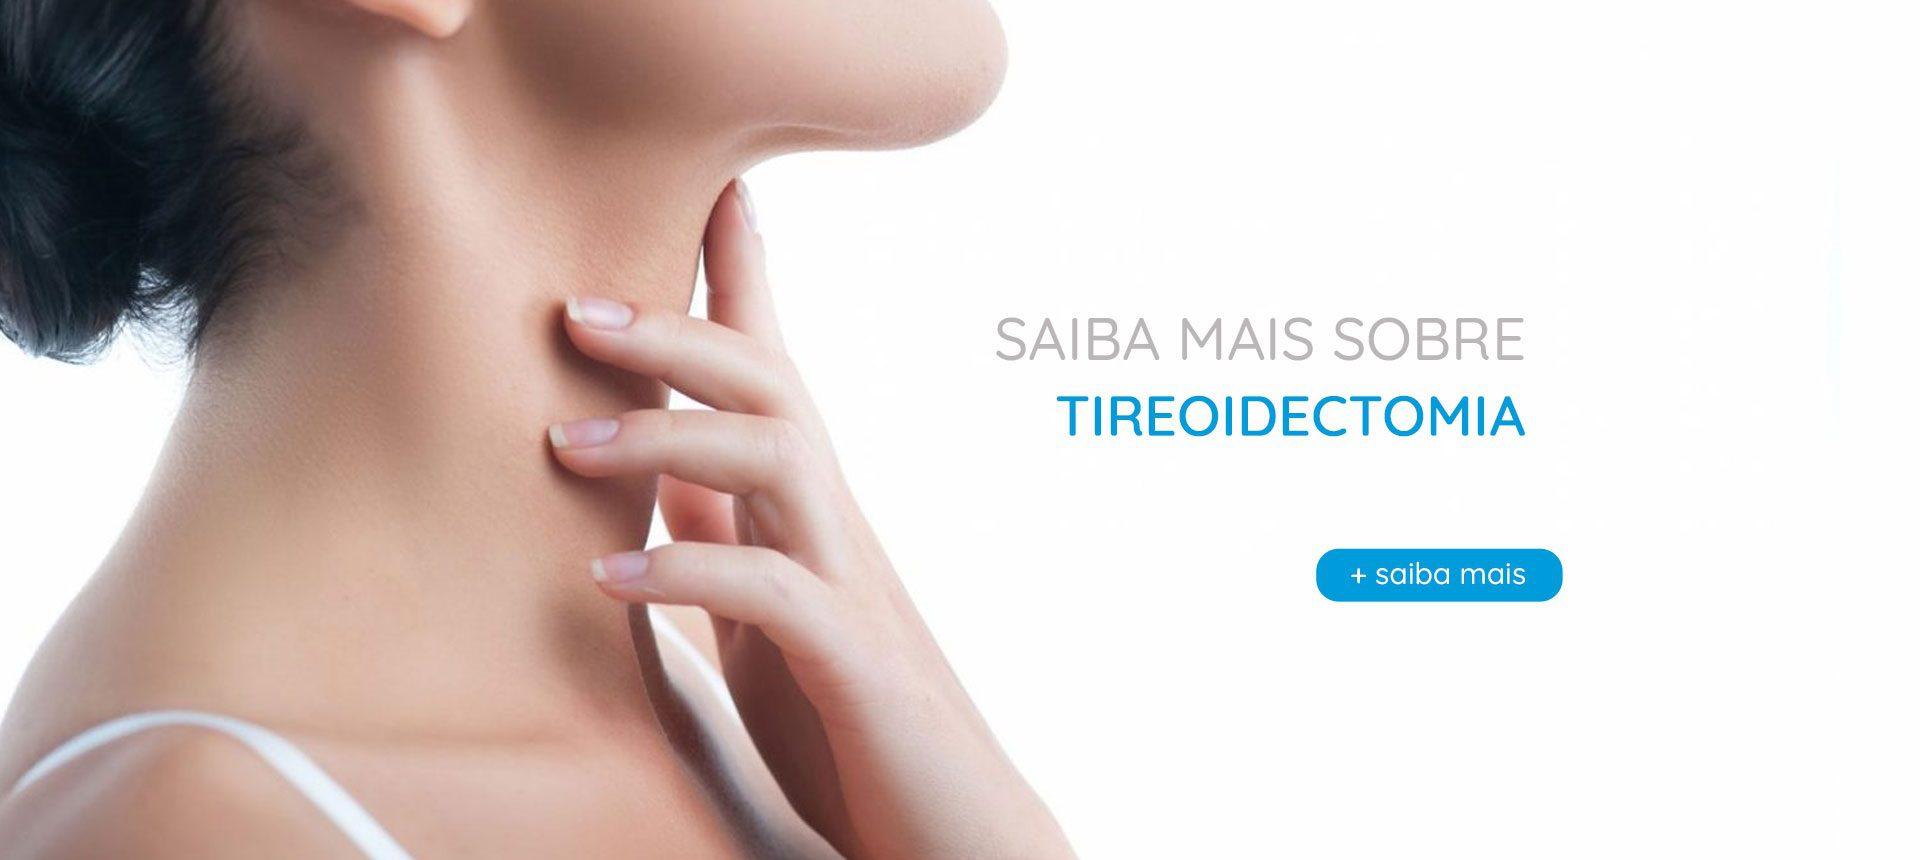 Saiba mais sobre a Tireoidectomia | Dr. Arthur Vicentini CRM 154.086